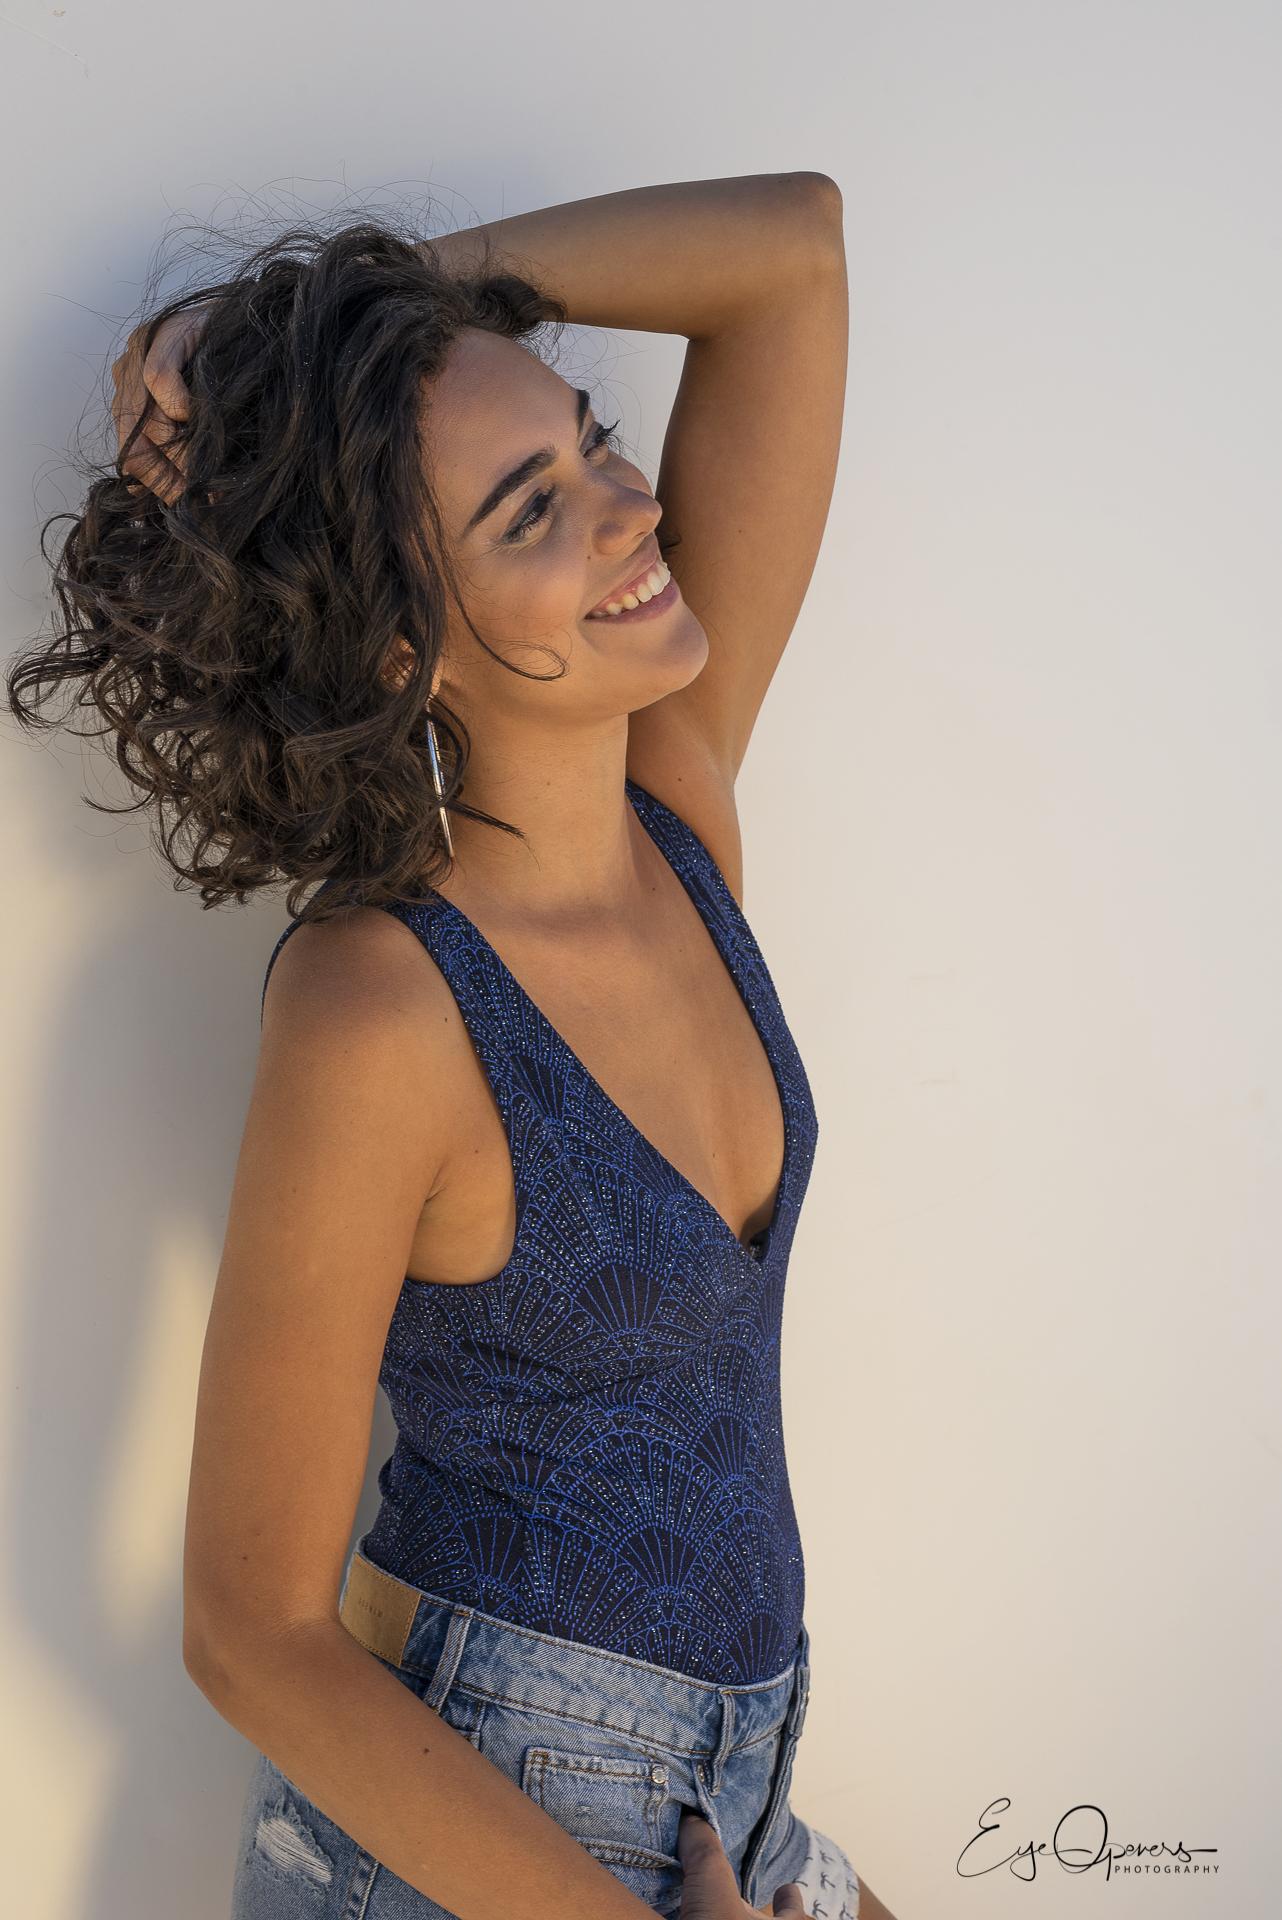 Visagie Sarah Cluyse